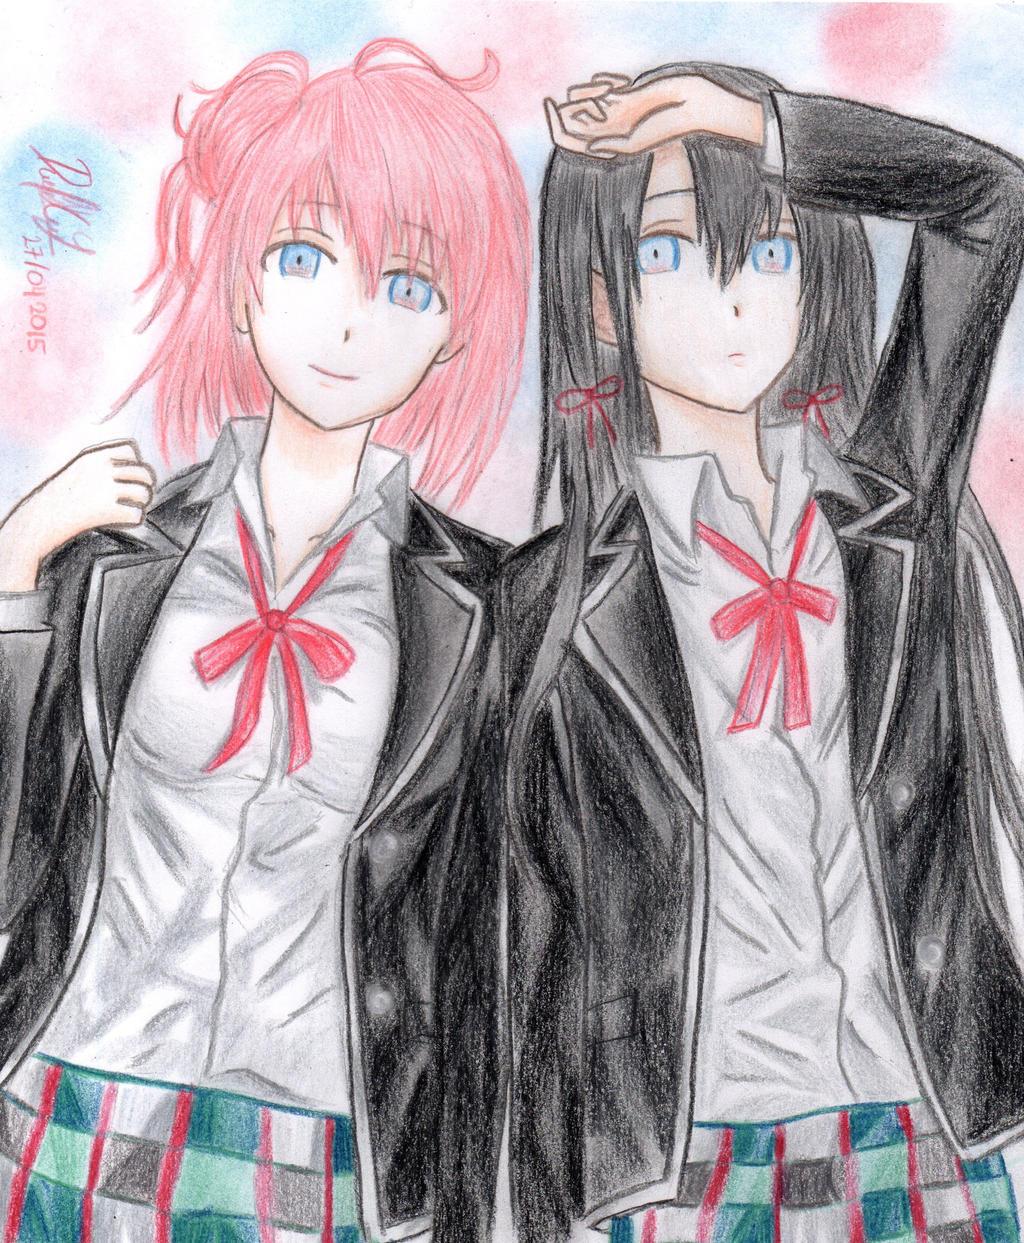 Yui and Yukino by danielcamilo